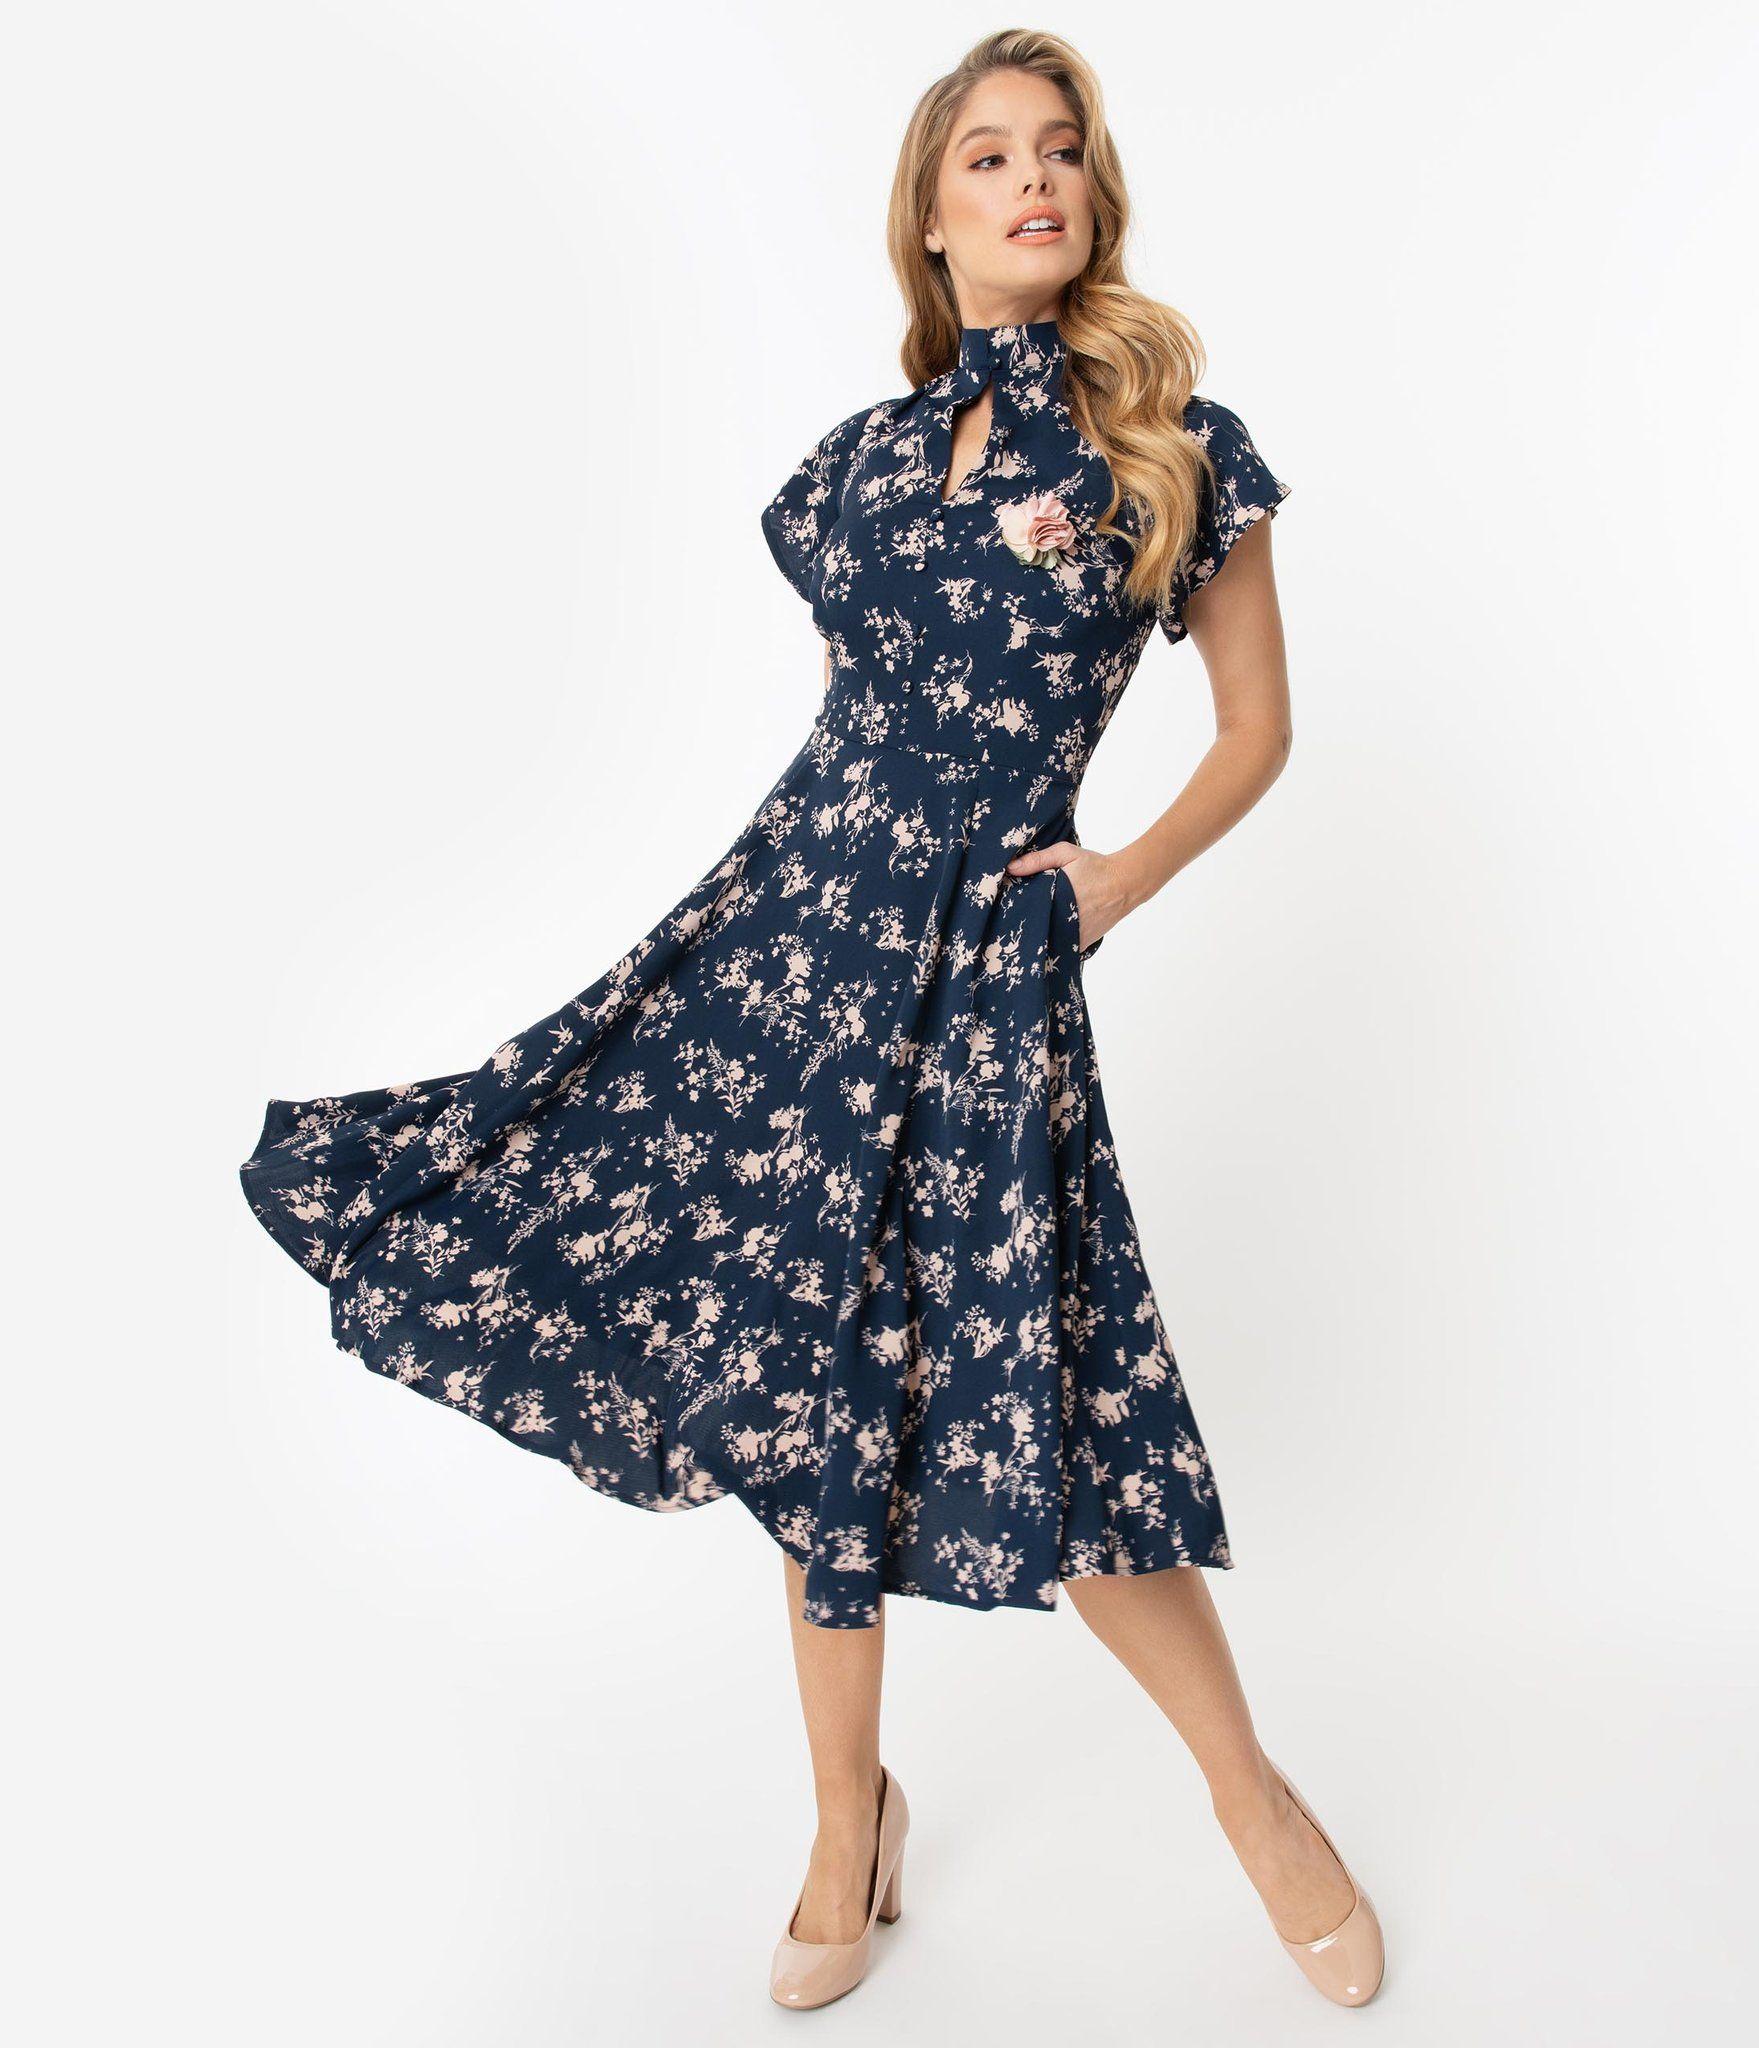 Unique Vintage 1950s Navy Pink Floral Baltimore Swing Dress In 2020 Swing Dress Vintage Floral Dress Vintage Inspired Dresses